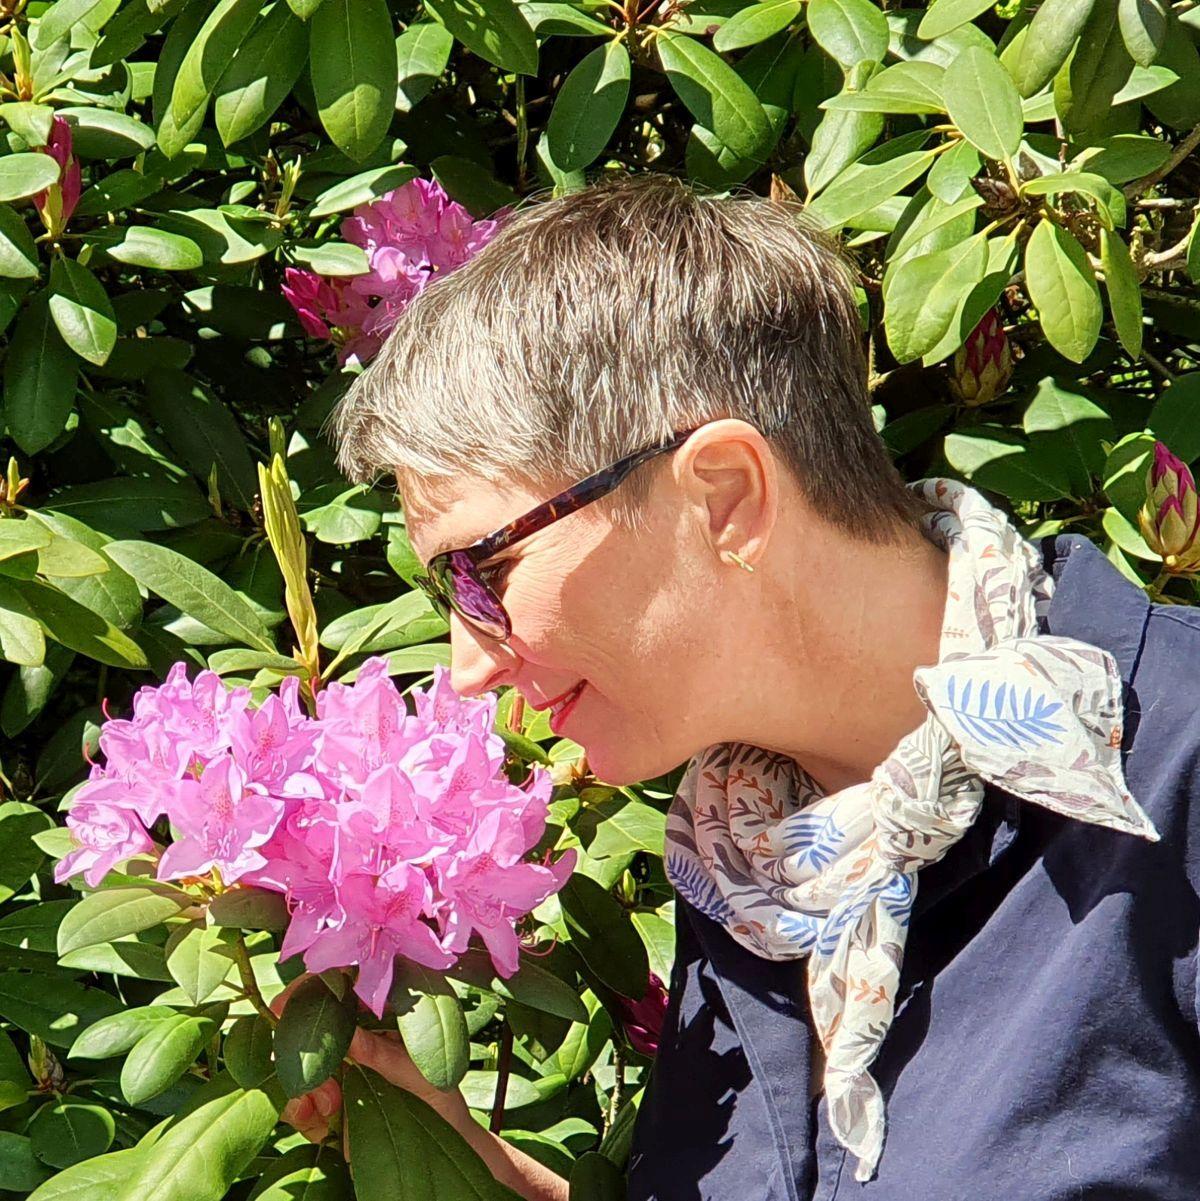 Ines Meyrose - Outfit 2021 - Frühlingseinheitslook - persönliche Uniform - dunkelblaue Bluse - Portrait- Ü50 Bloggerin